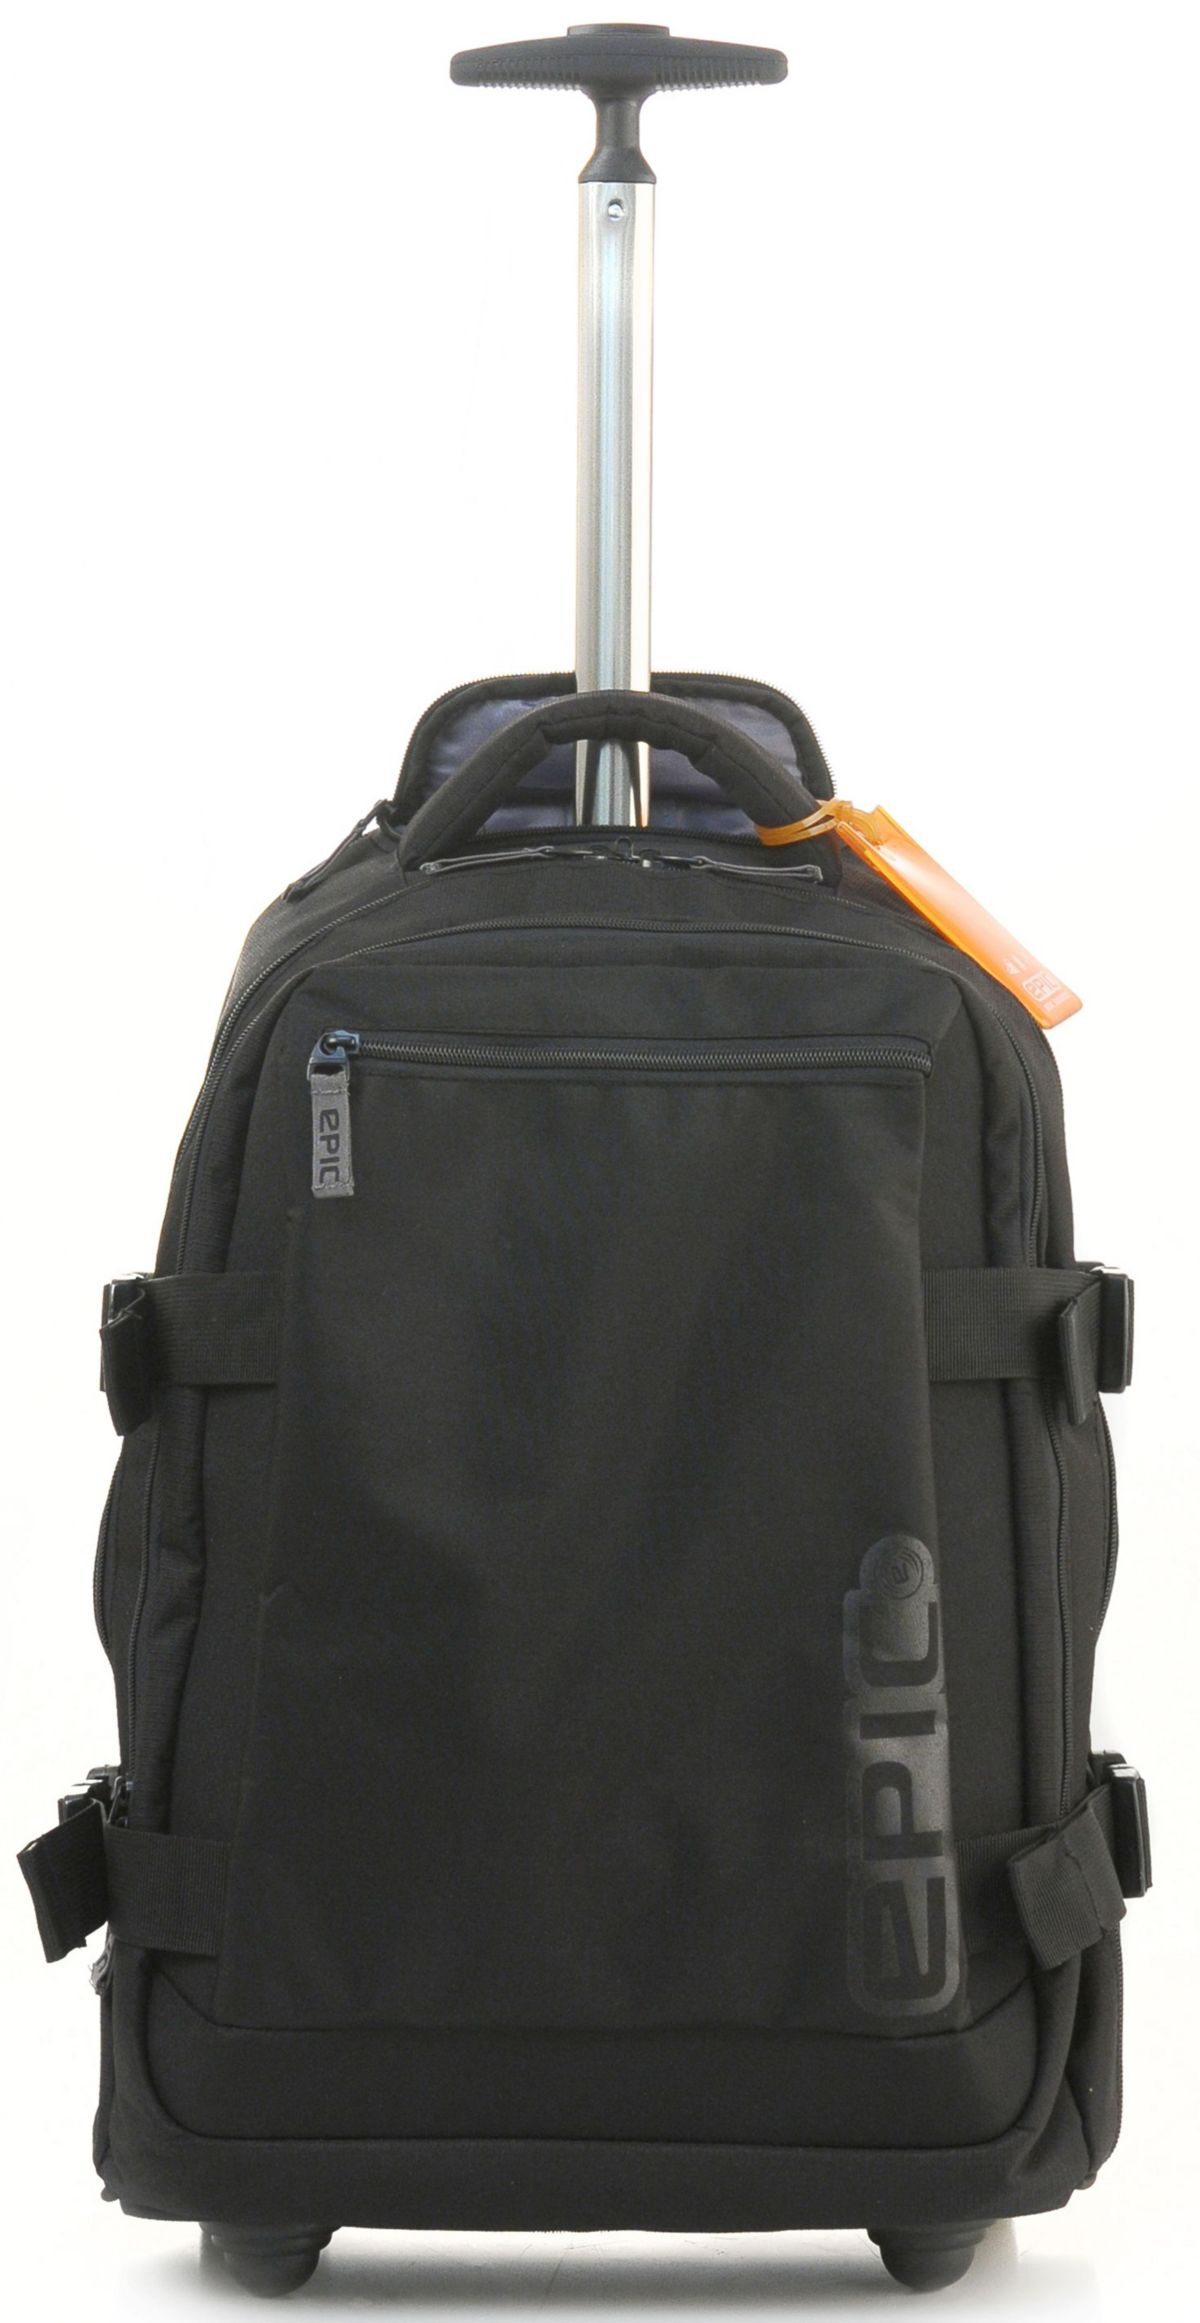 5ae7fd1d1e8df Epic Weichgepäck Kabinen-Trolley-Rucksack